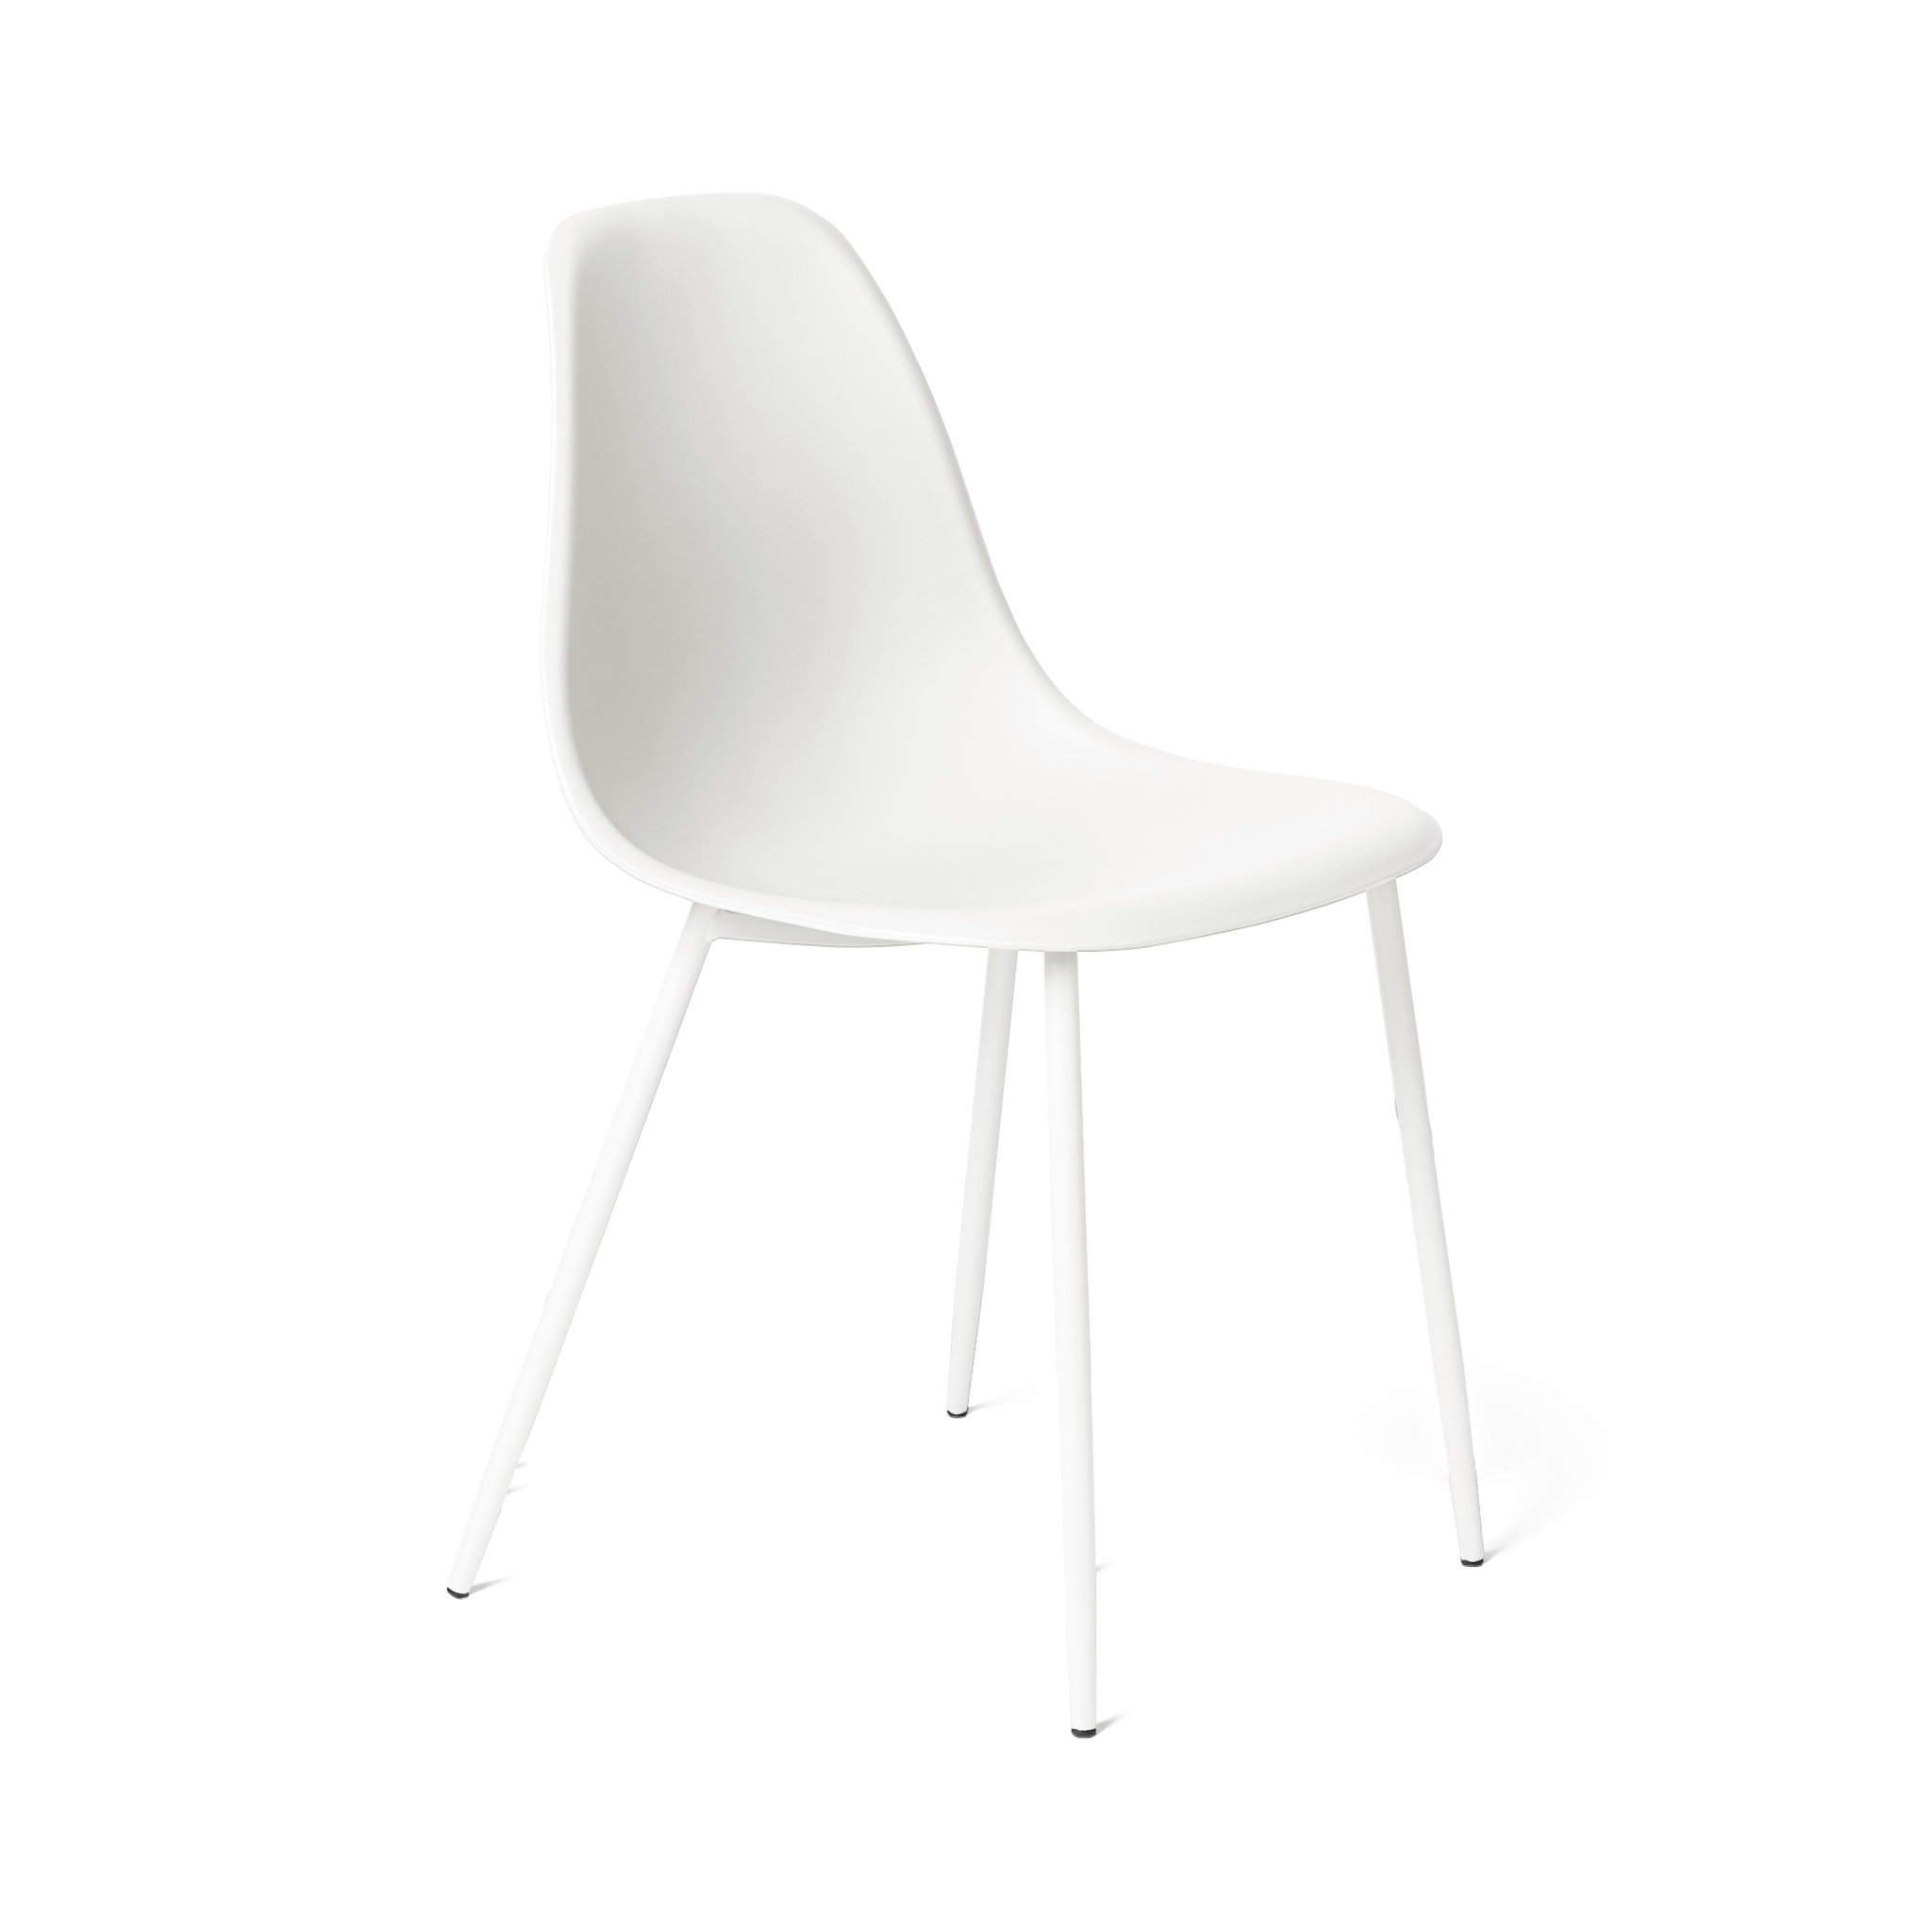 Stol, Uno 48 cm, offwhite